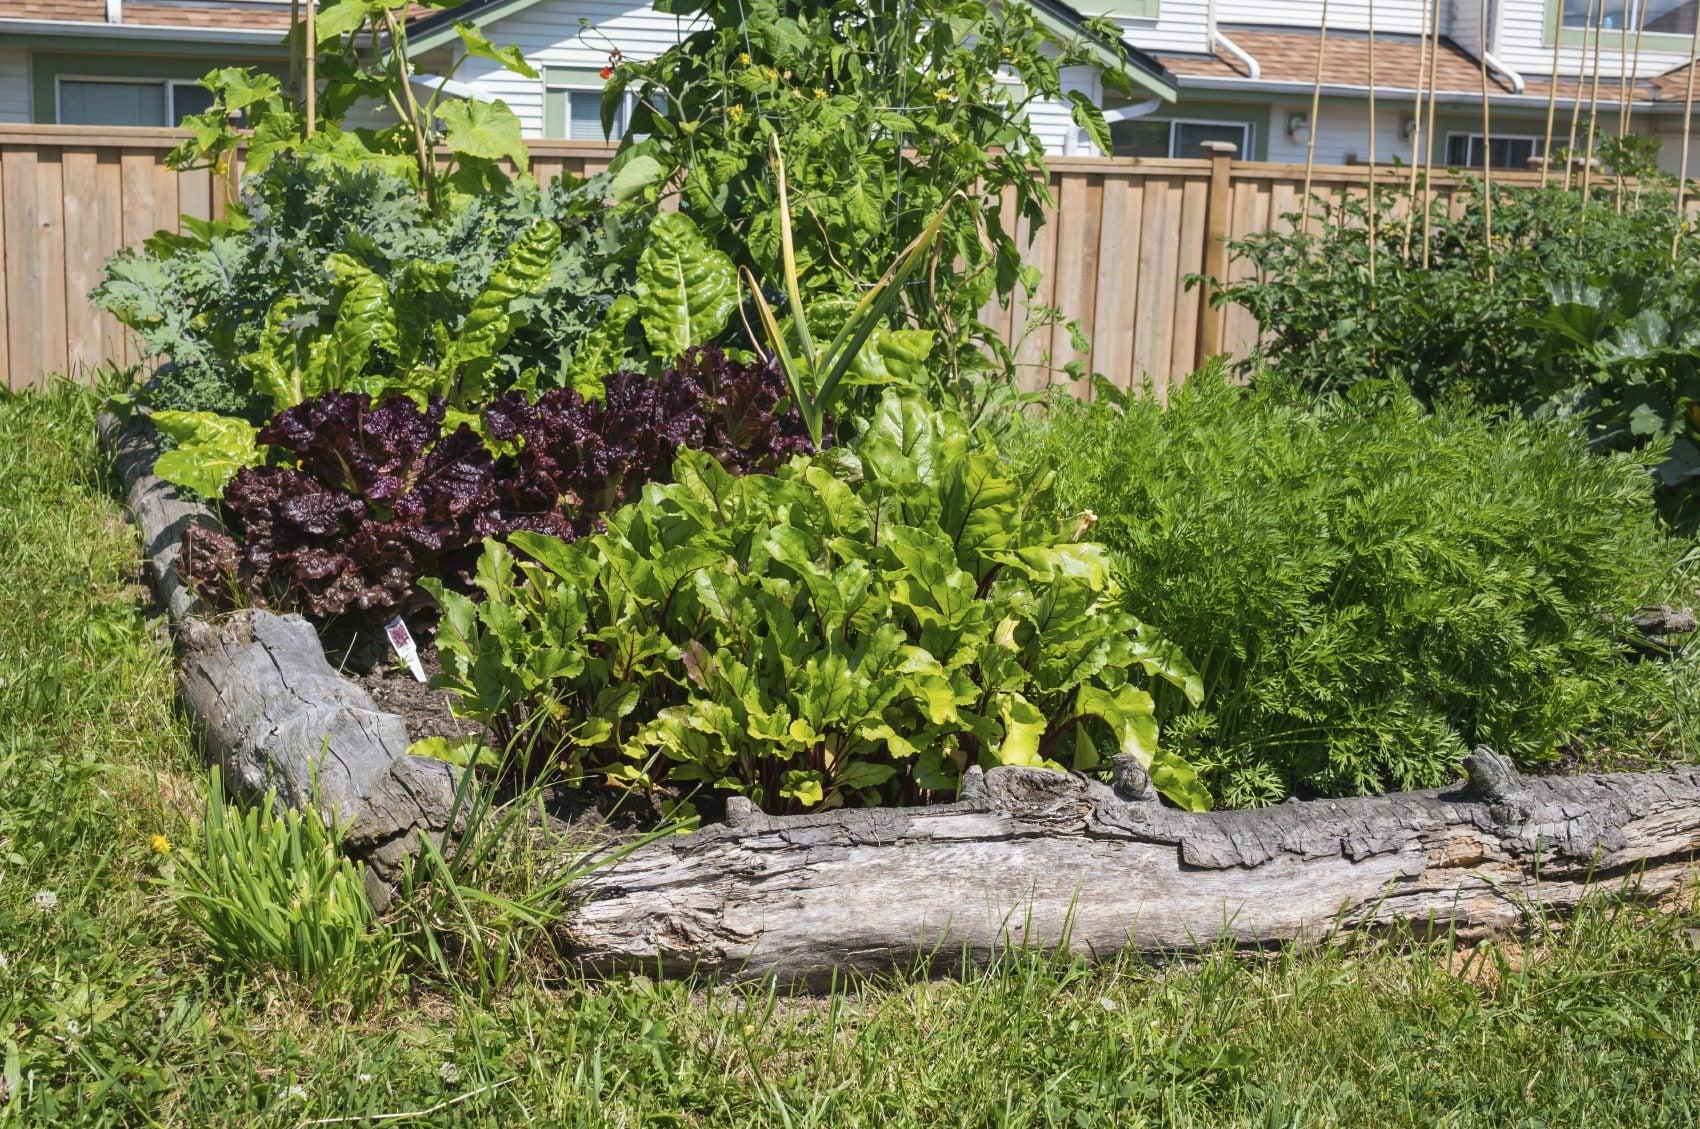 Urban Garden Problems: Common Issues Affecting Urban Gardens